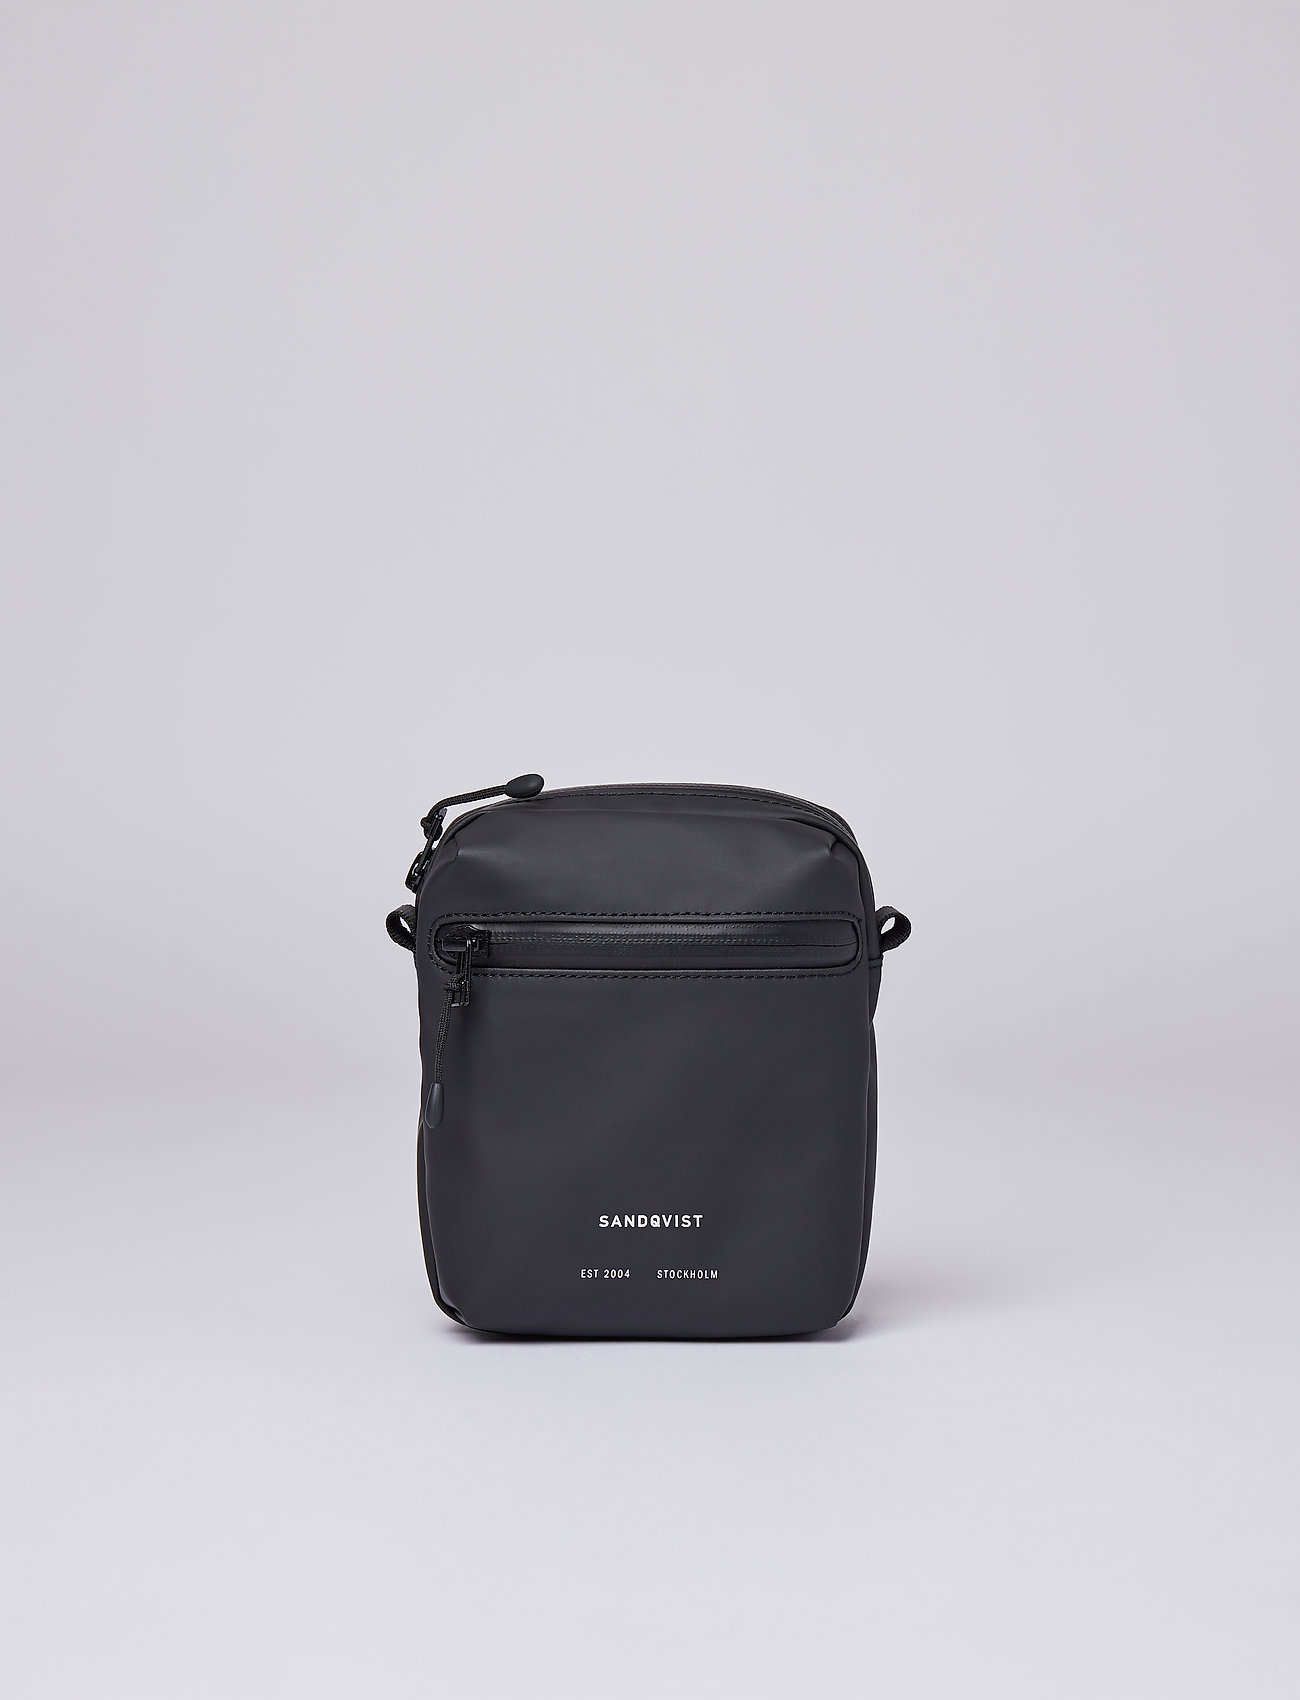 SANDQVIST - POE - tassen - black - 0